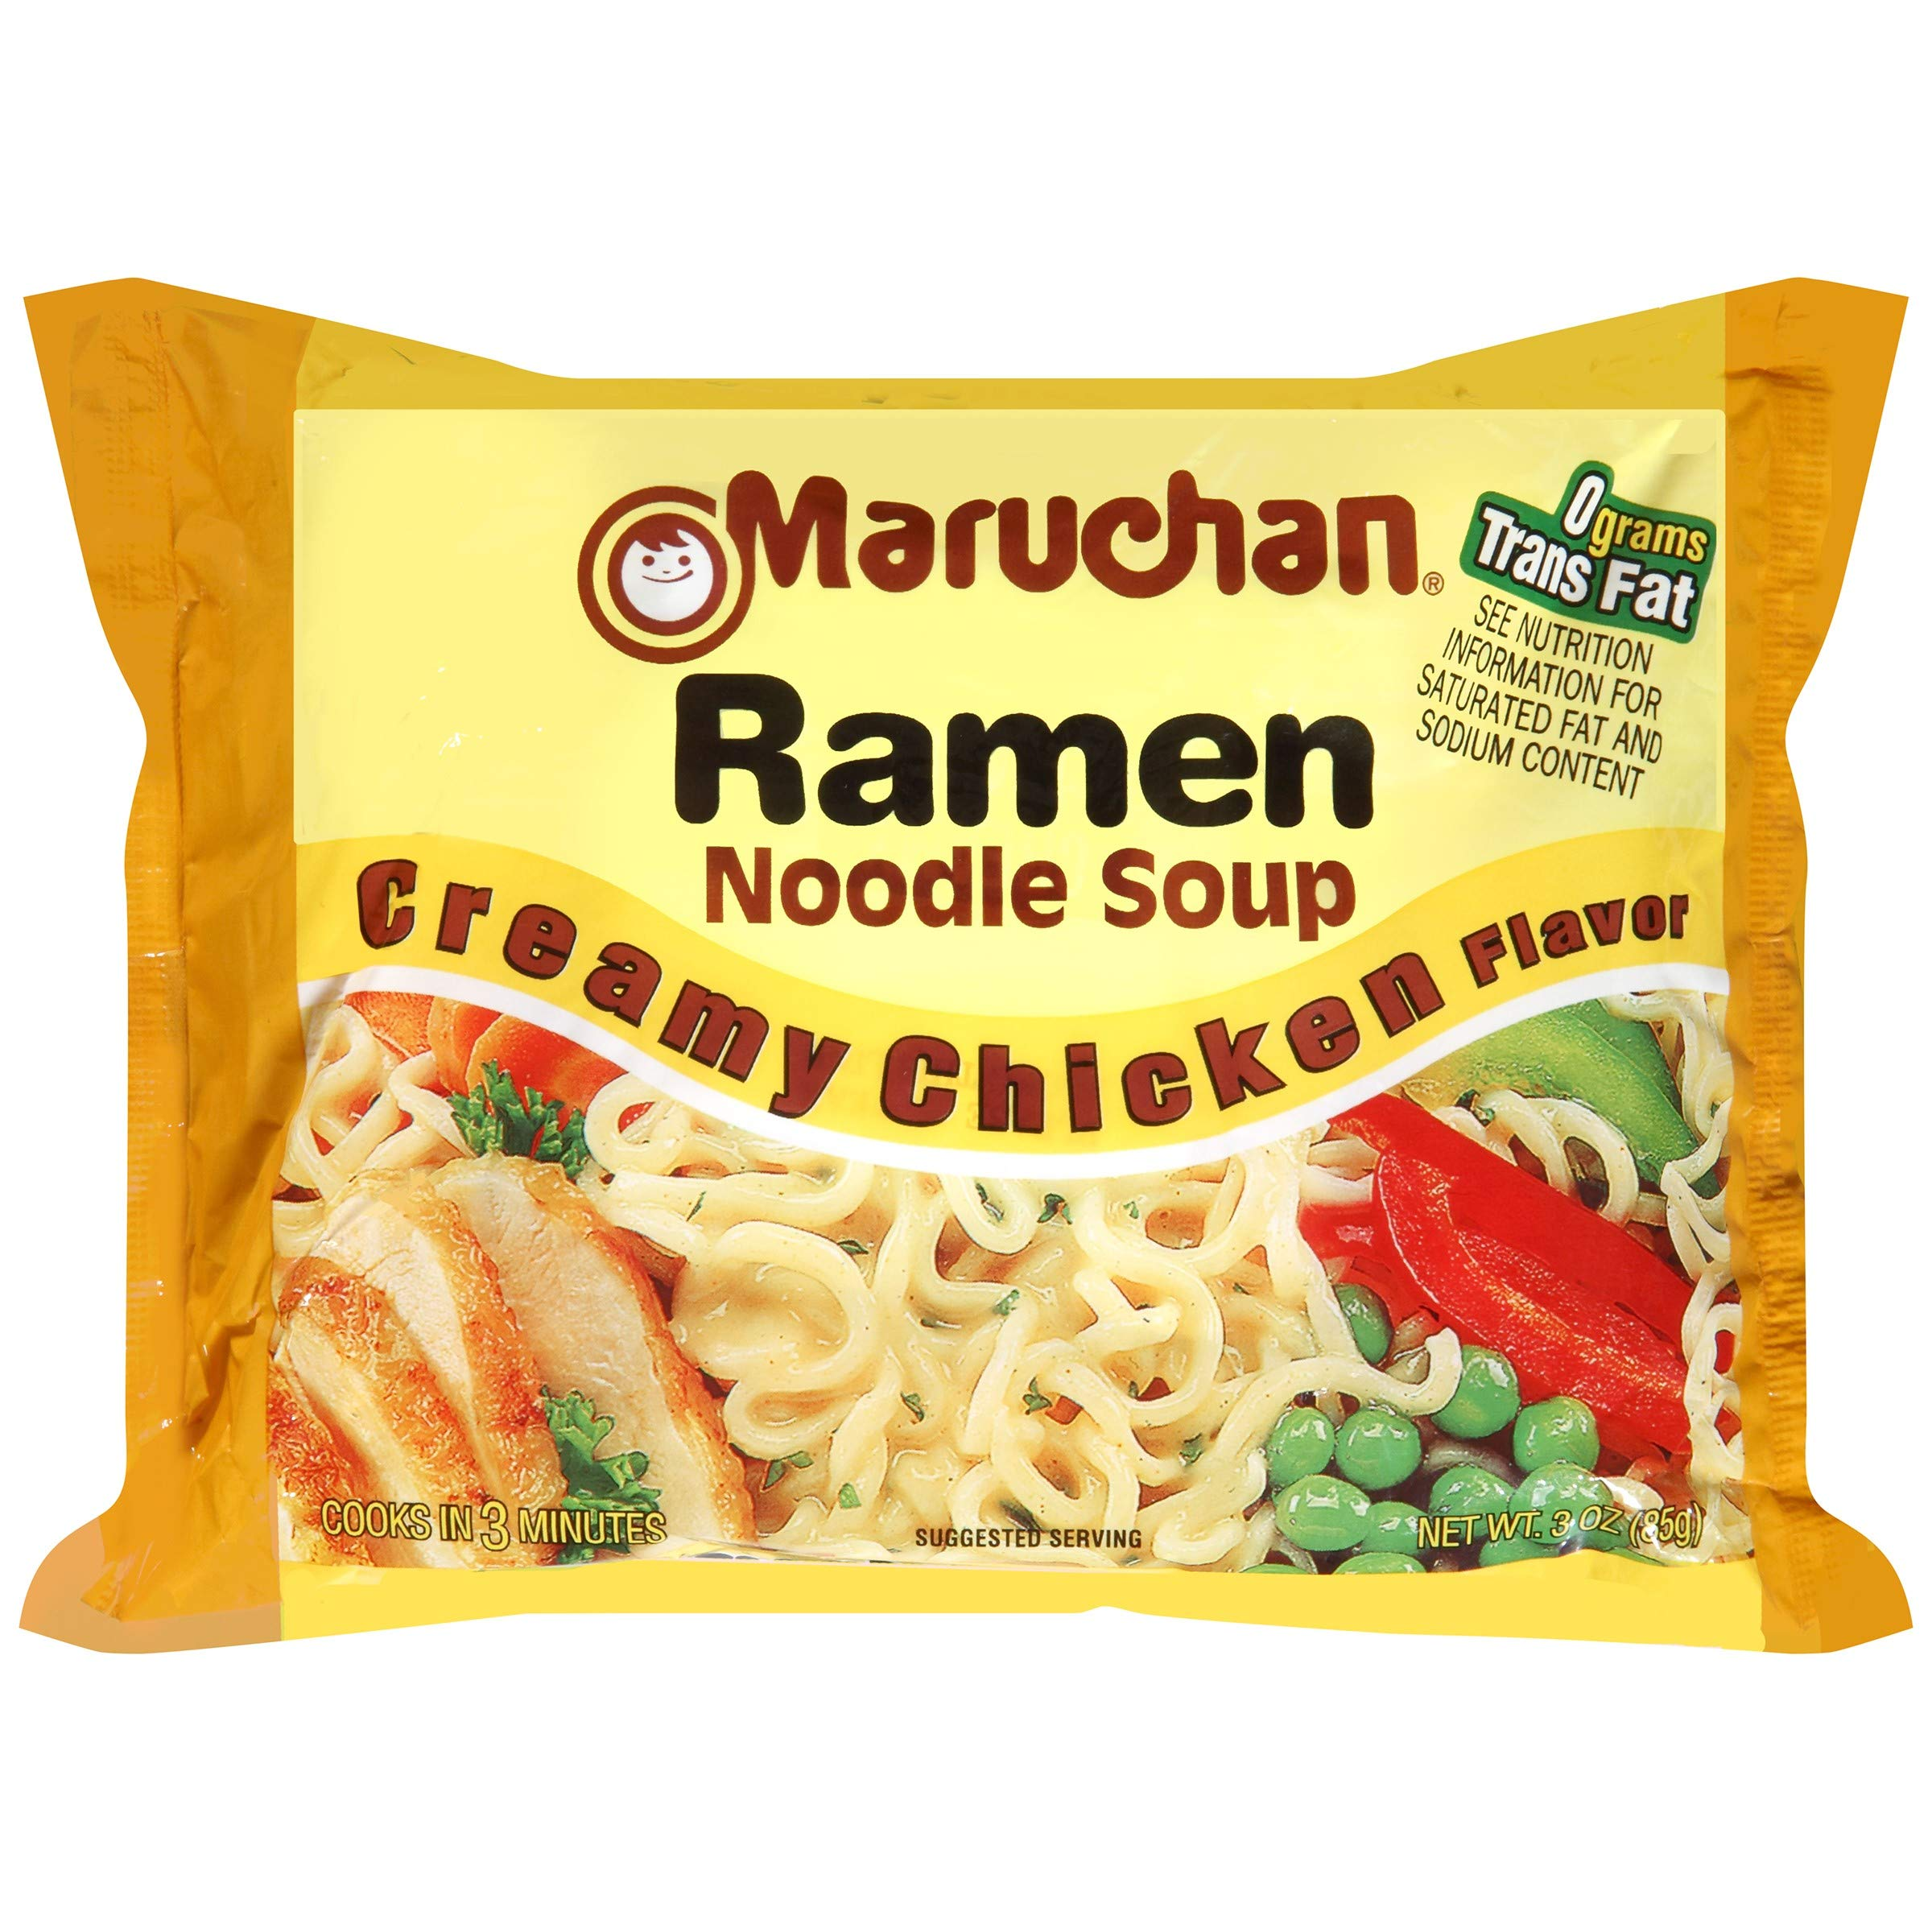 Maruchan Ramen, Creamy Chicken, 3-ounce (Pack of 48)